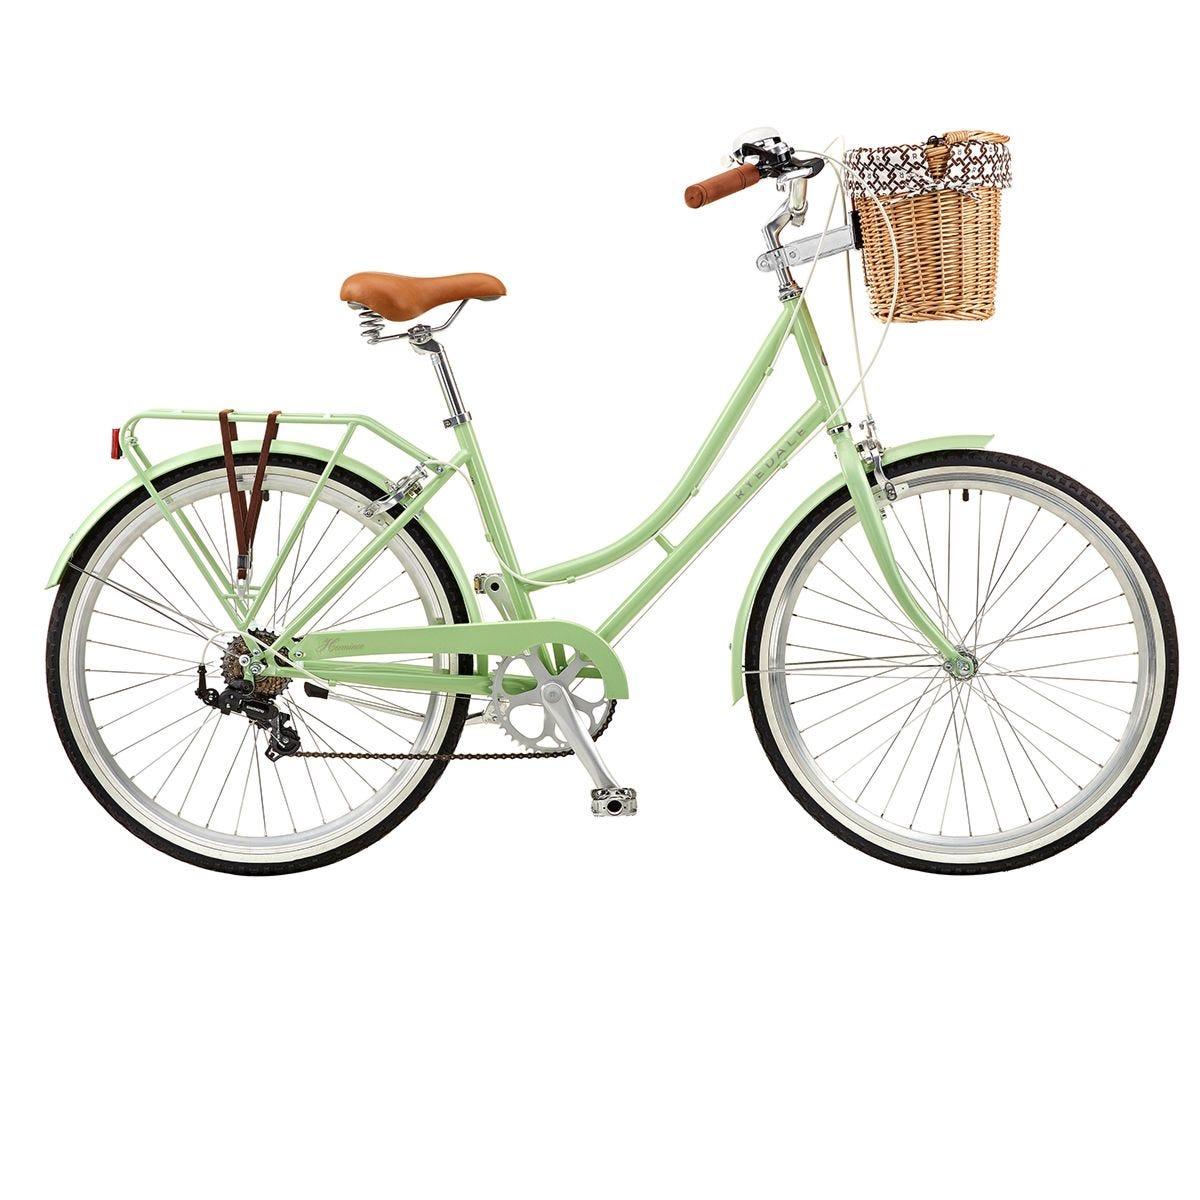 Ryedale Hermione 26 Inch Wheel 19 Inch Frame 7 Speed Ladies Heritage Bike - Peppermint